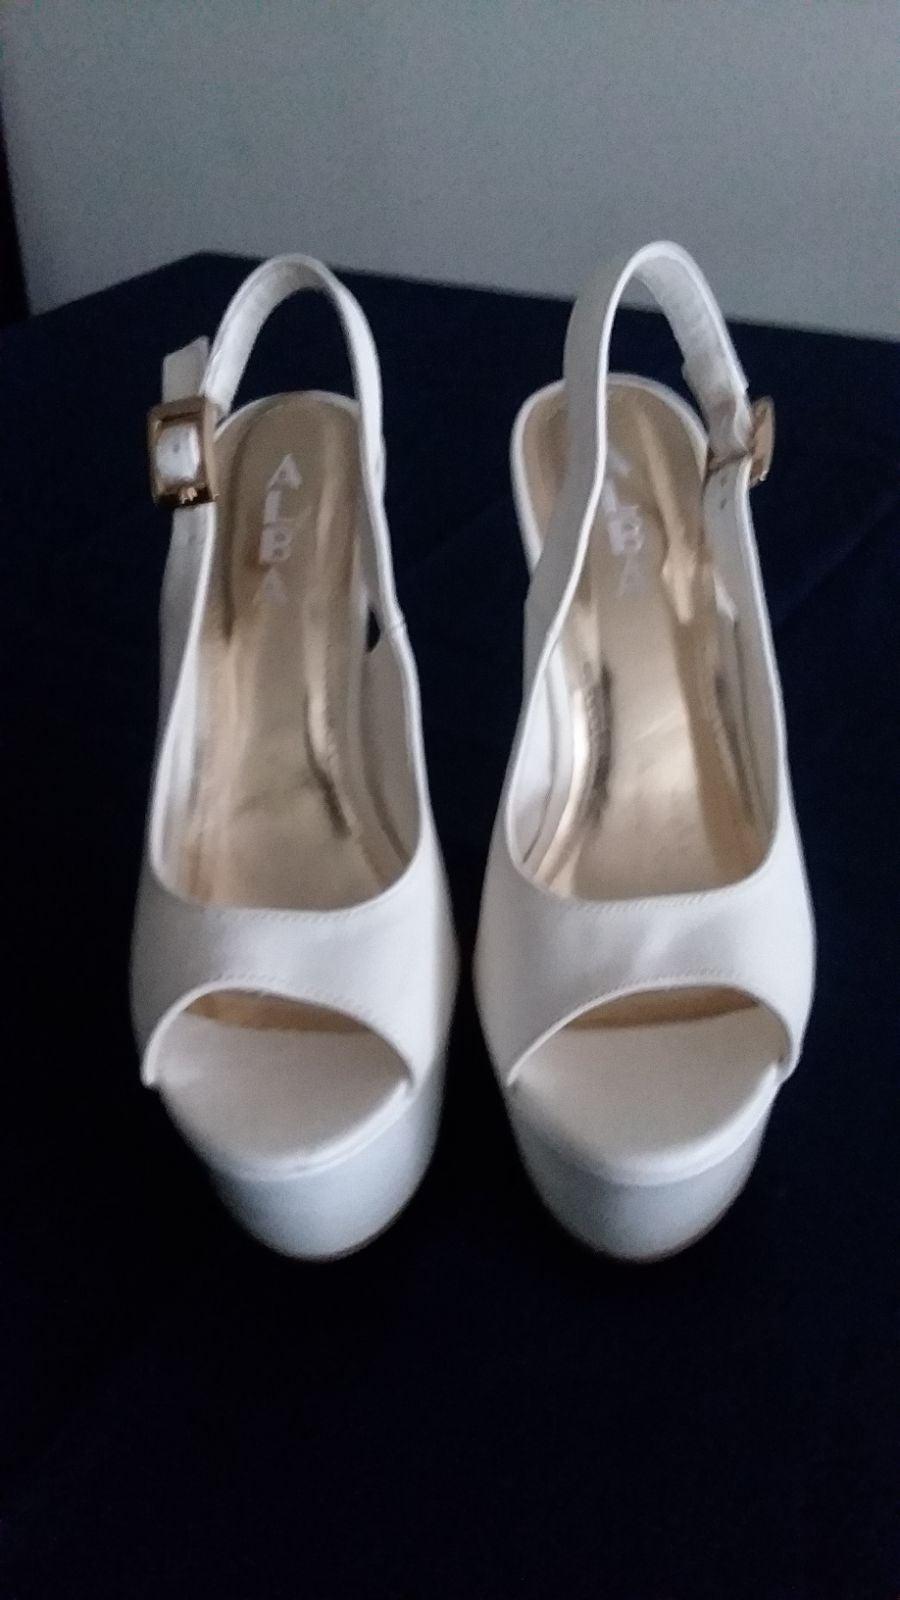 Shoes by Alba Sz. 7